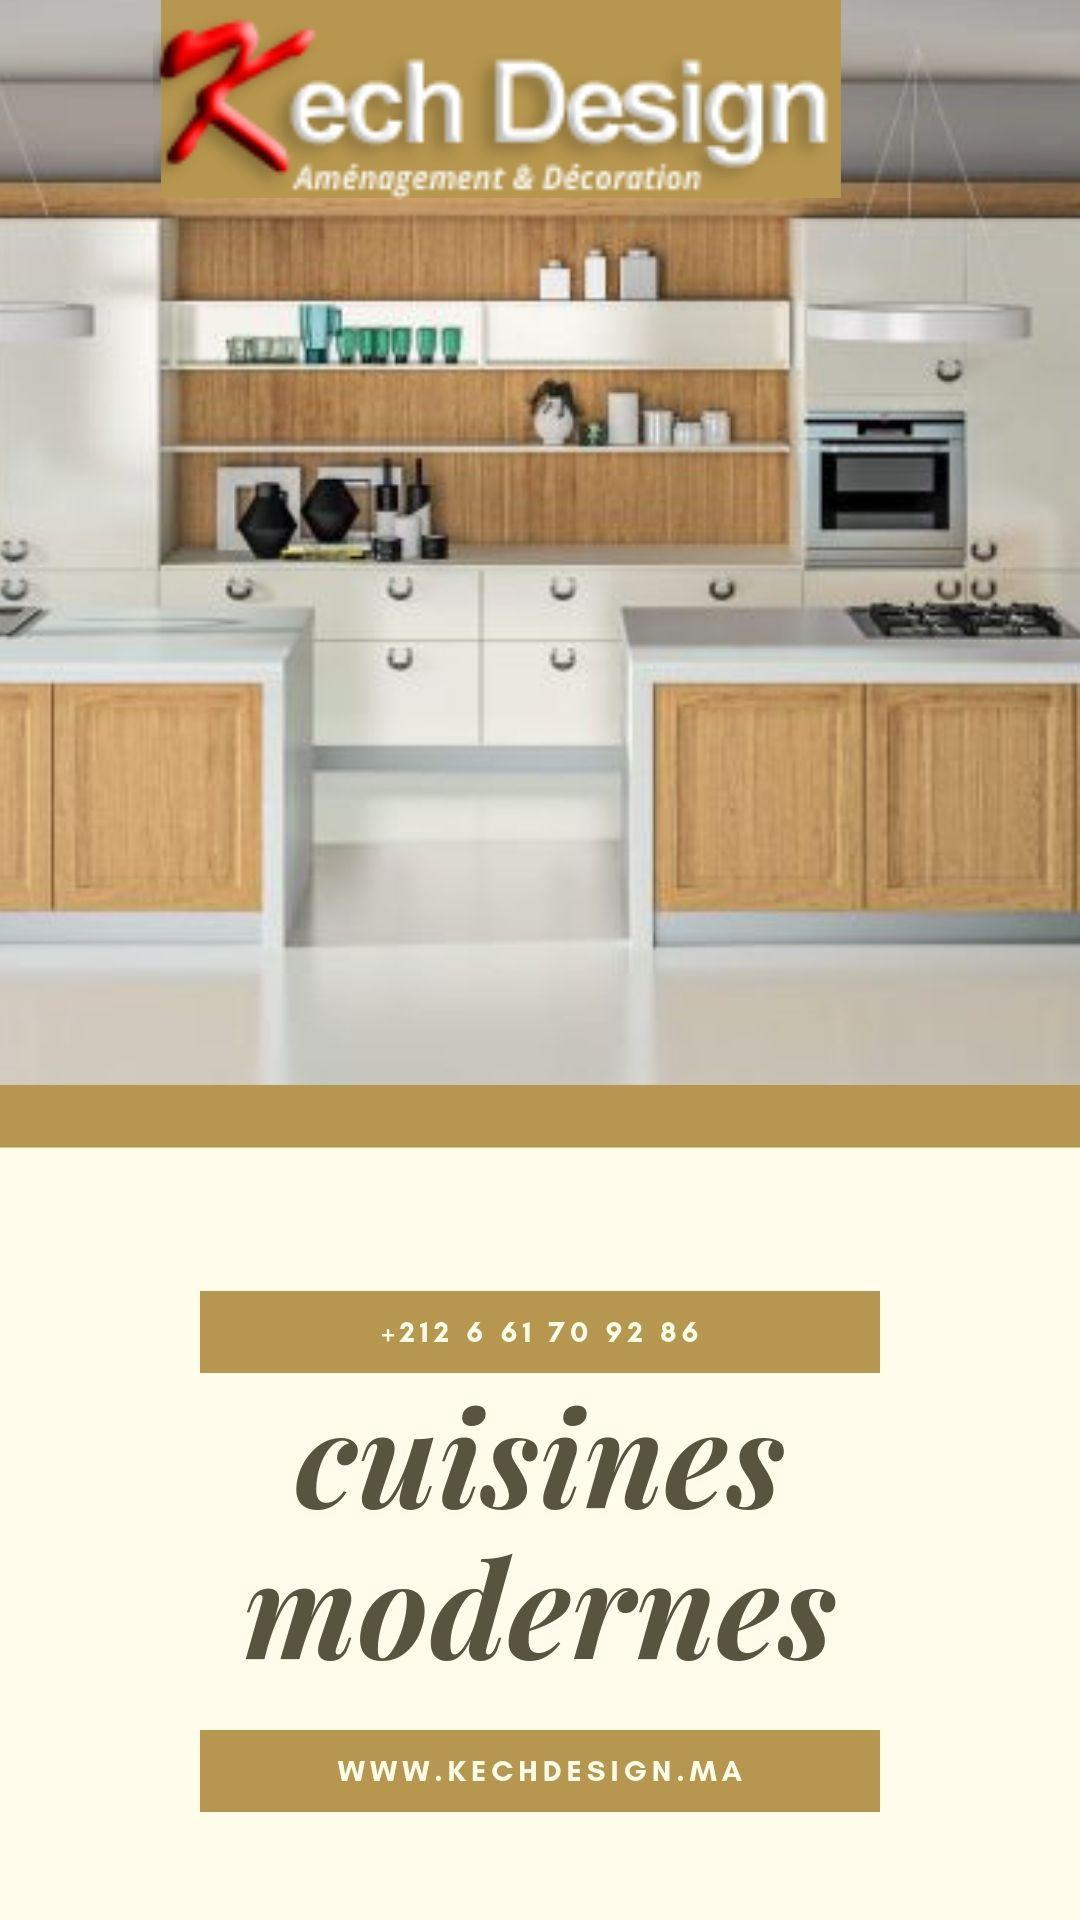 Cuisine Moderne Sur Mesure Cuisine Moderne Decoration Interieure Decoration De Cuisine